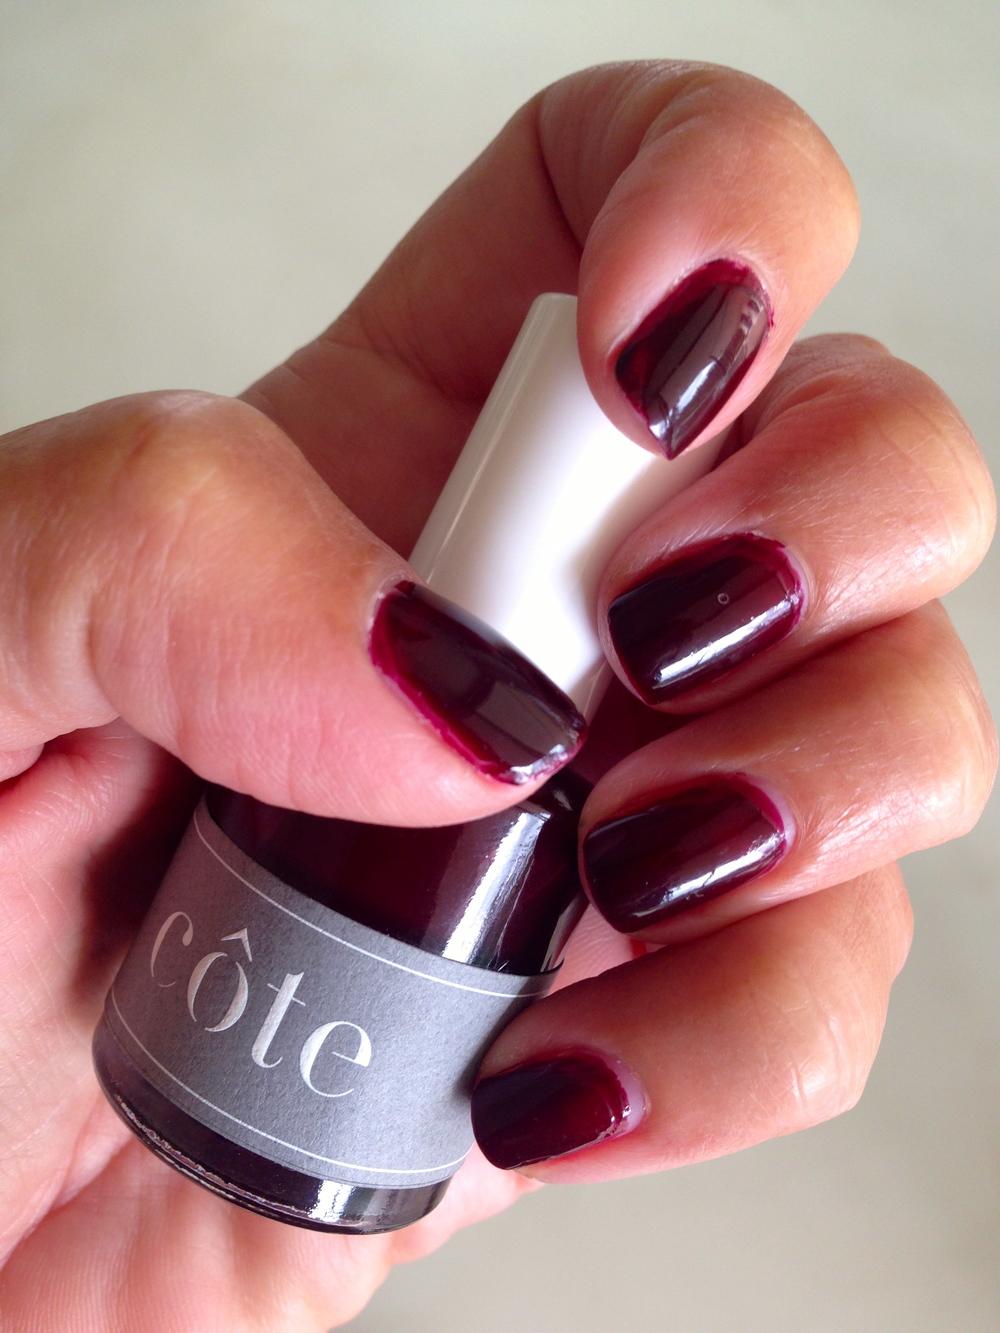 c  ôte polish No. 38 (oxblood).